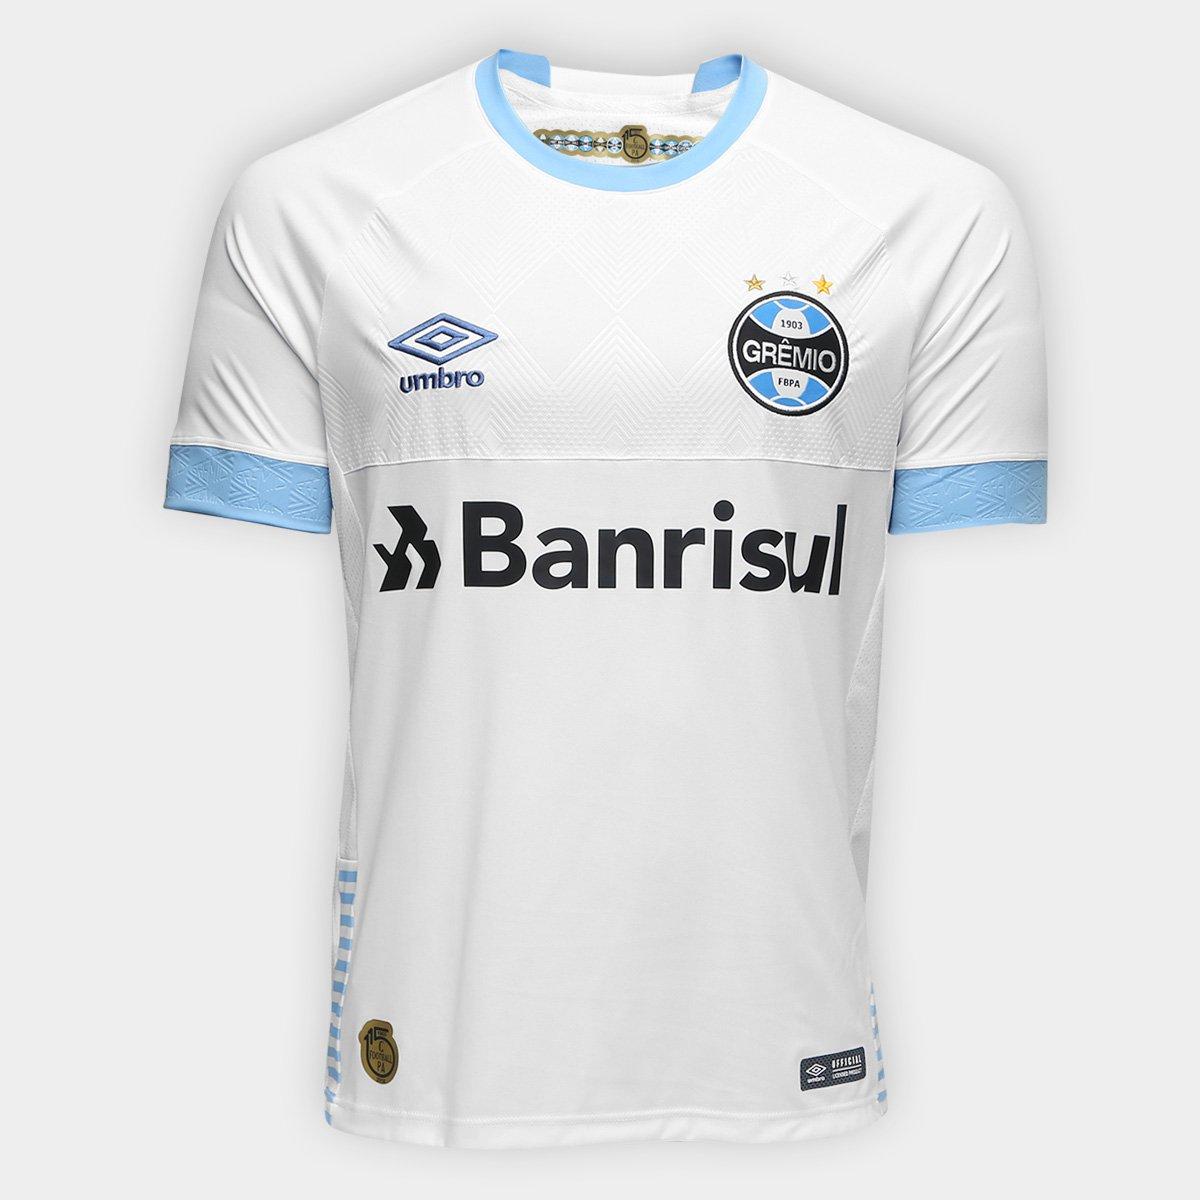 192a0e4ffd6b5 Camisa Grêmio II 2018 s n° Torcedor Umbro Masculina - Branco e Azul -  Compre Agora